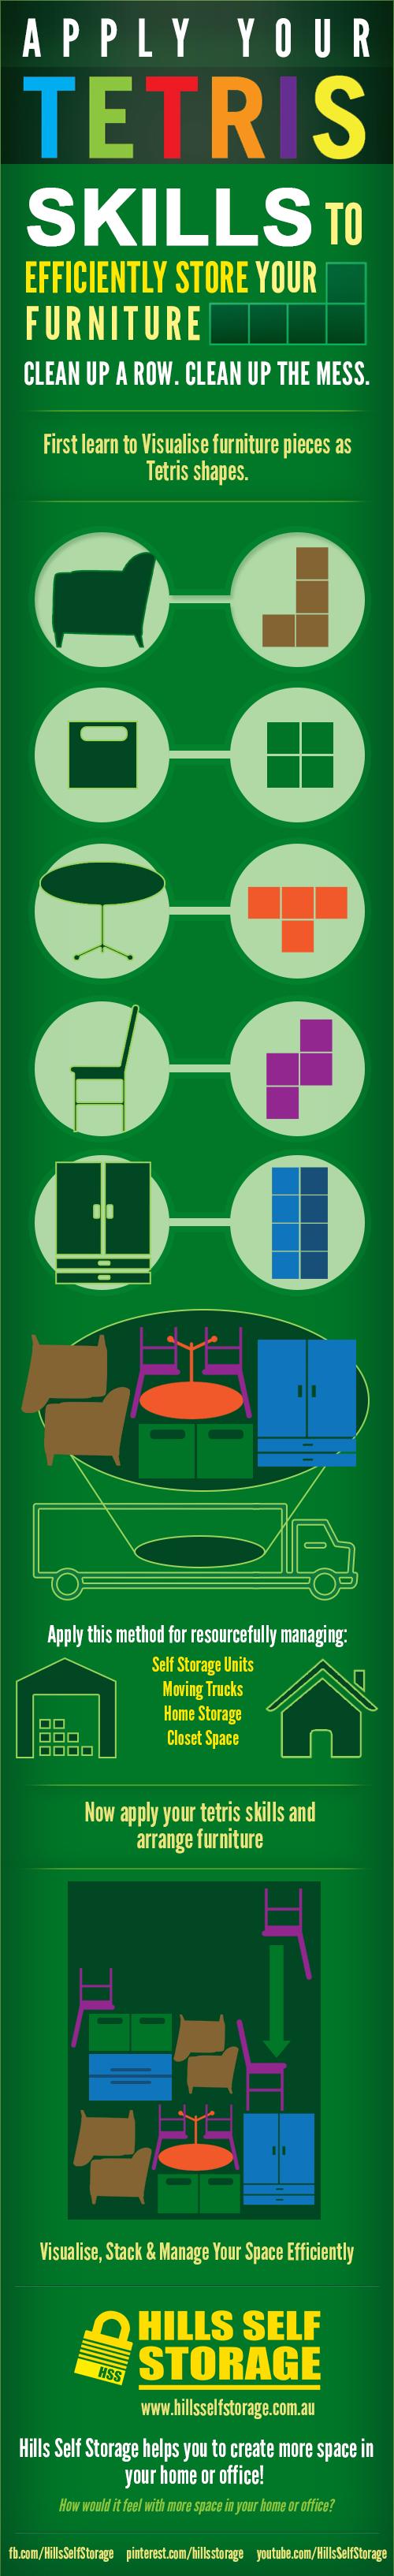 Furniture Storage Tips